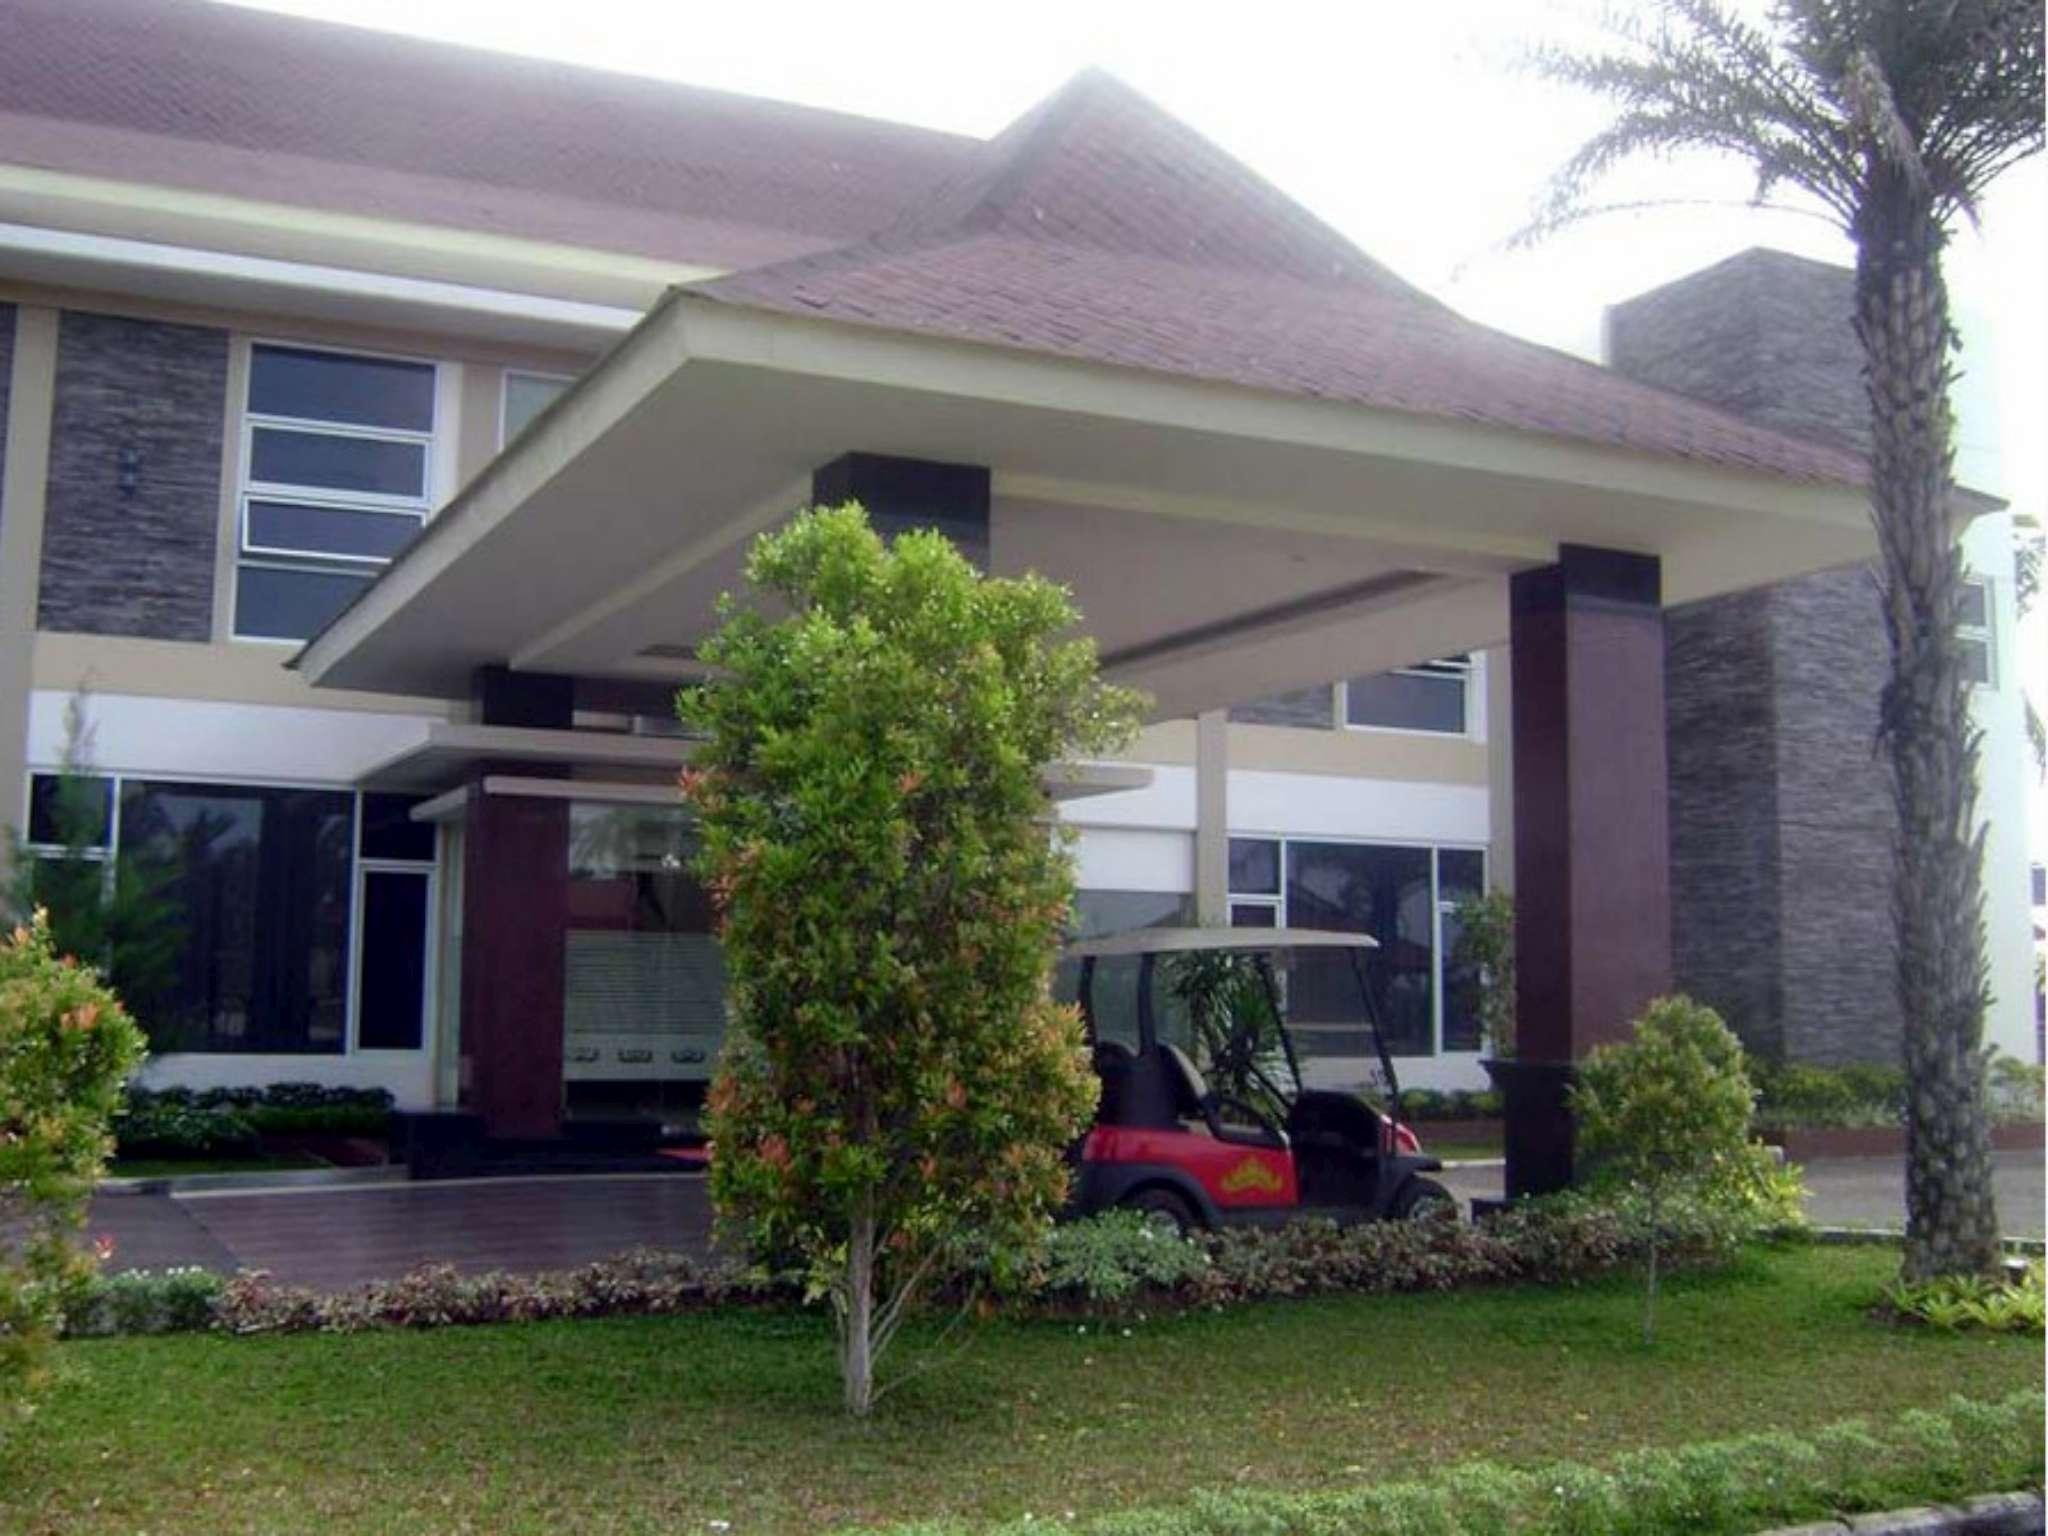 negeri baru hotel resort kalianda from 31 save on agoda rh agoda com